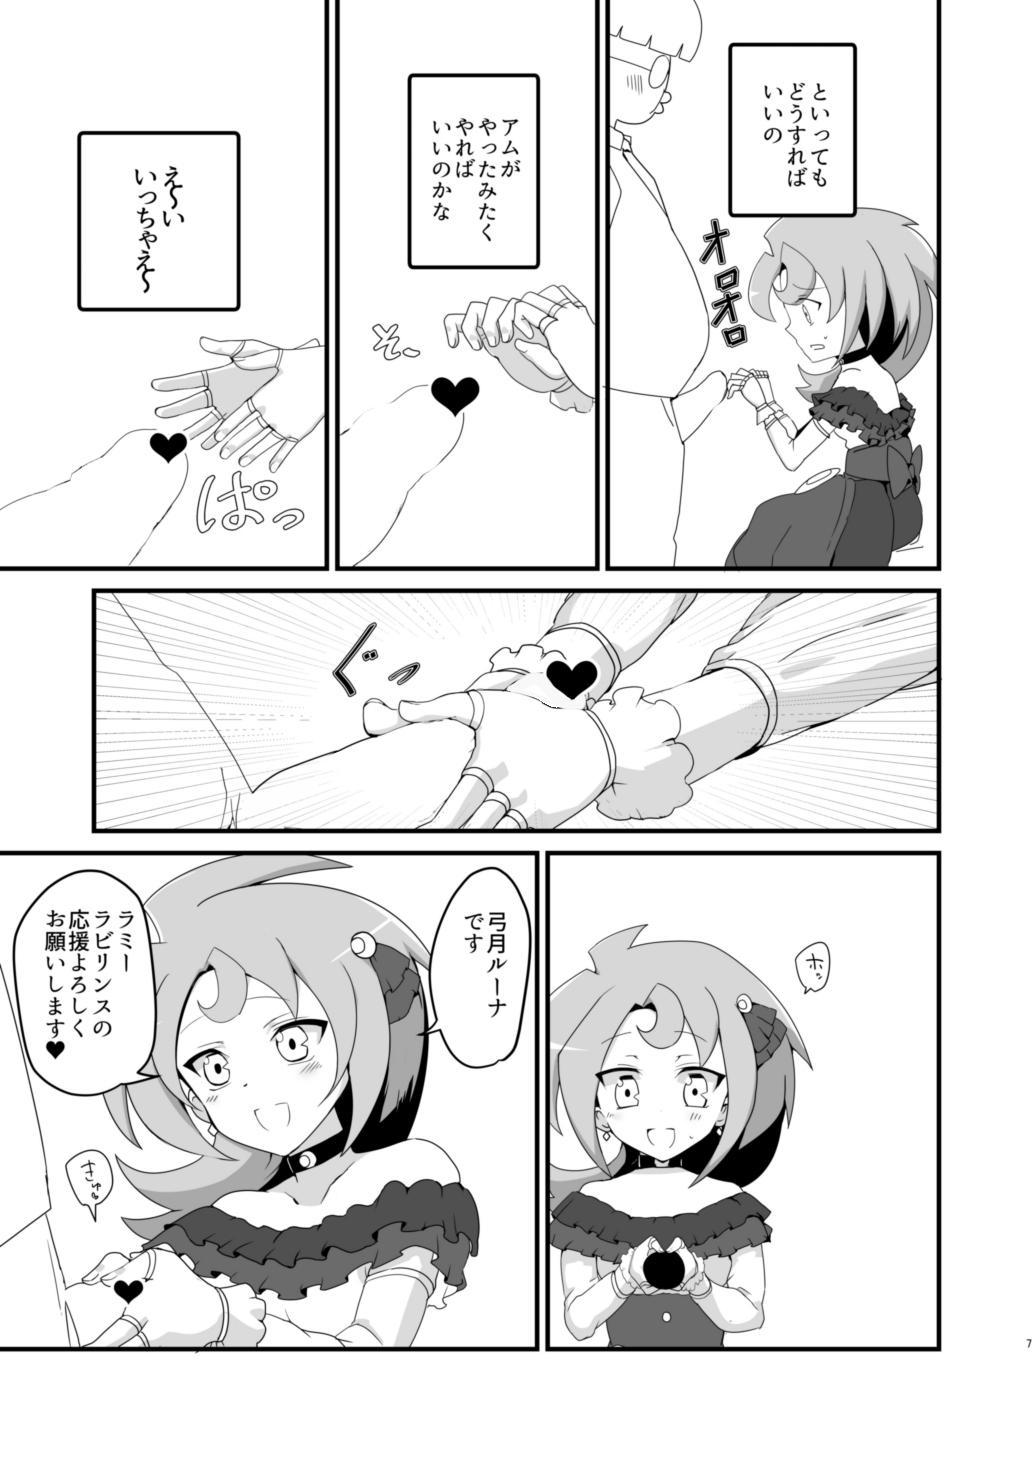 LunaAm O♂n♂n Akushuukai 5